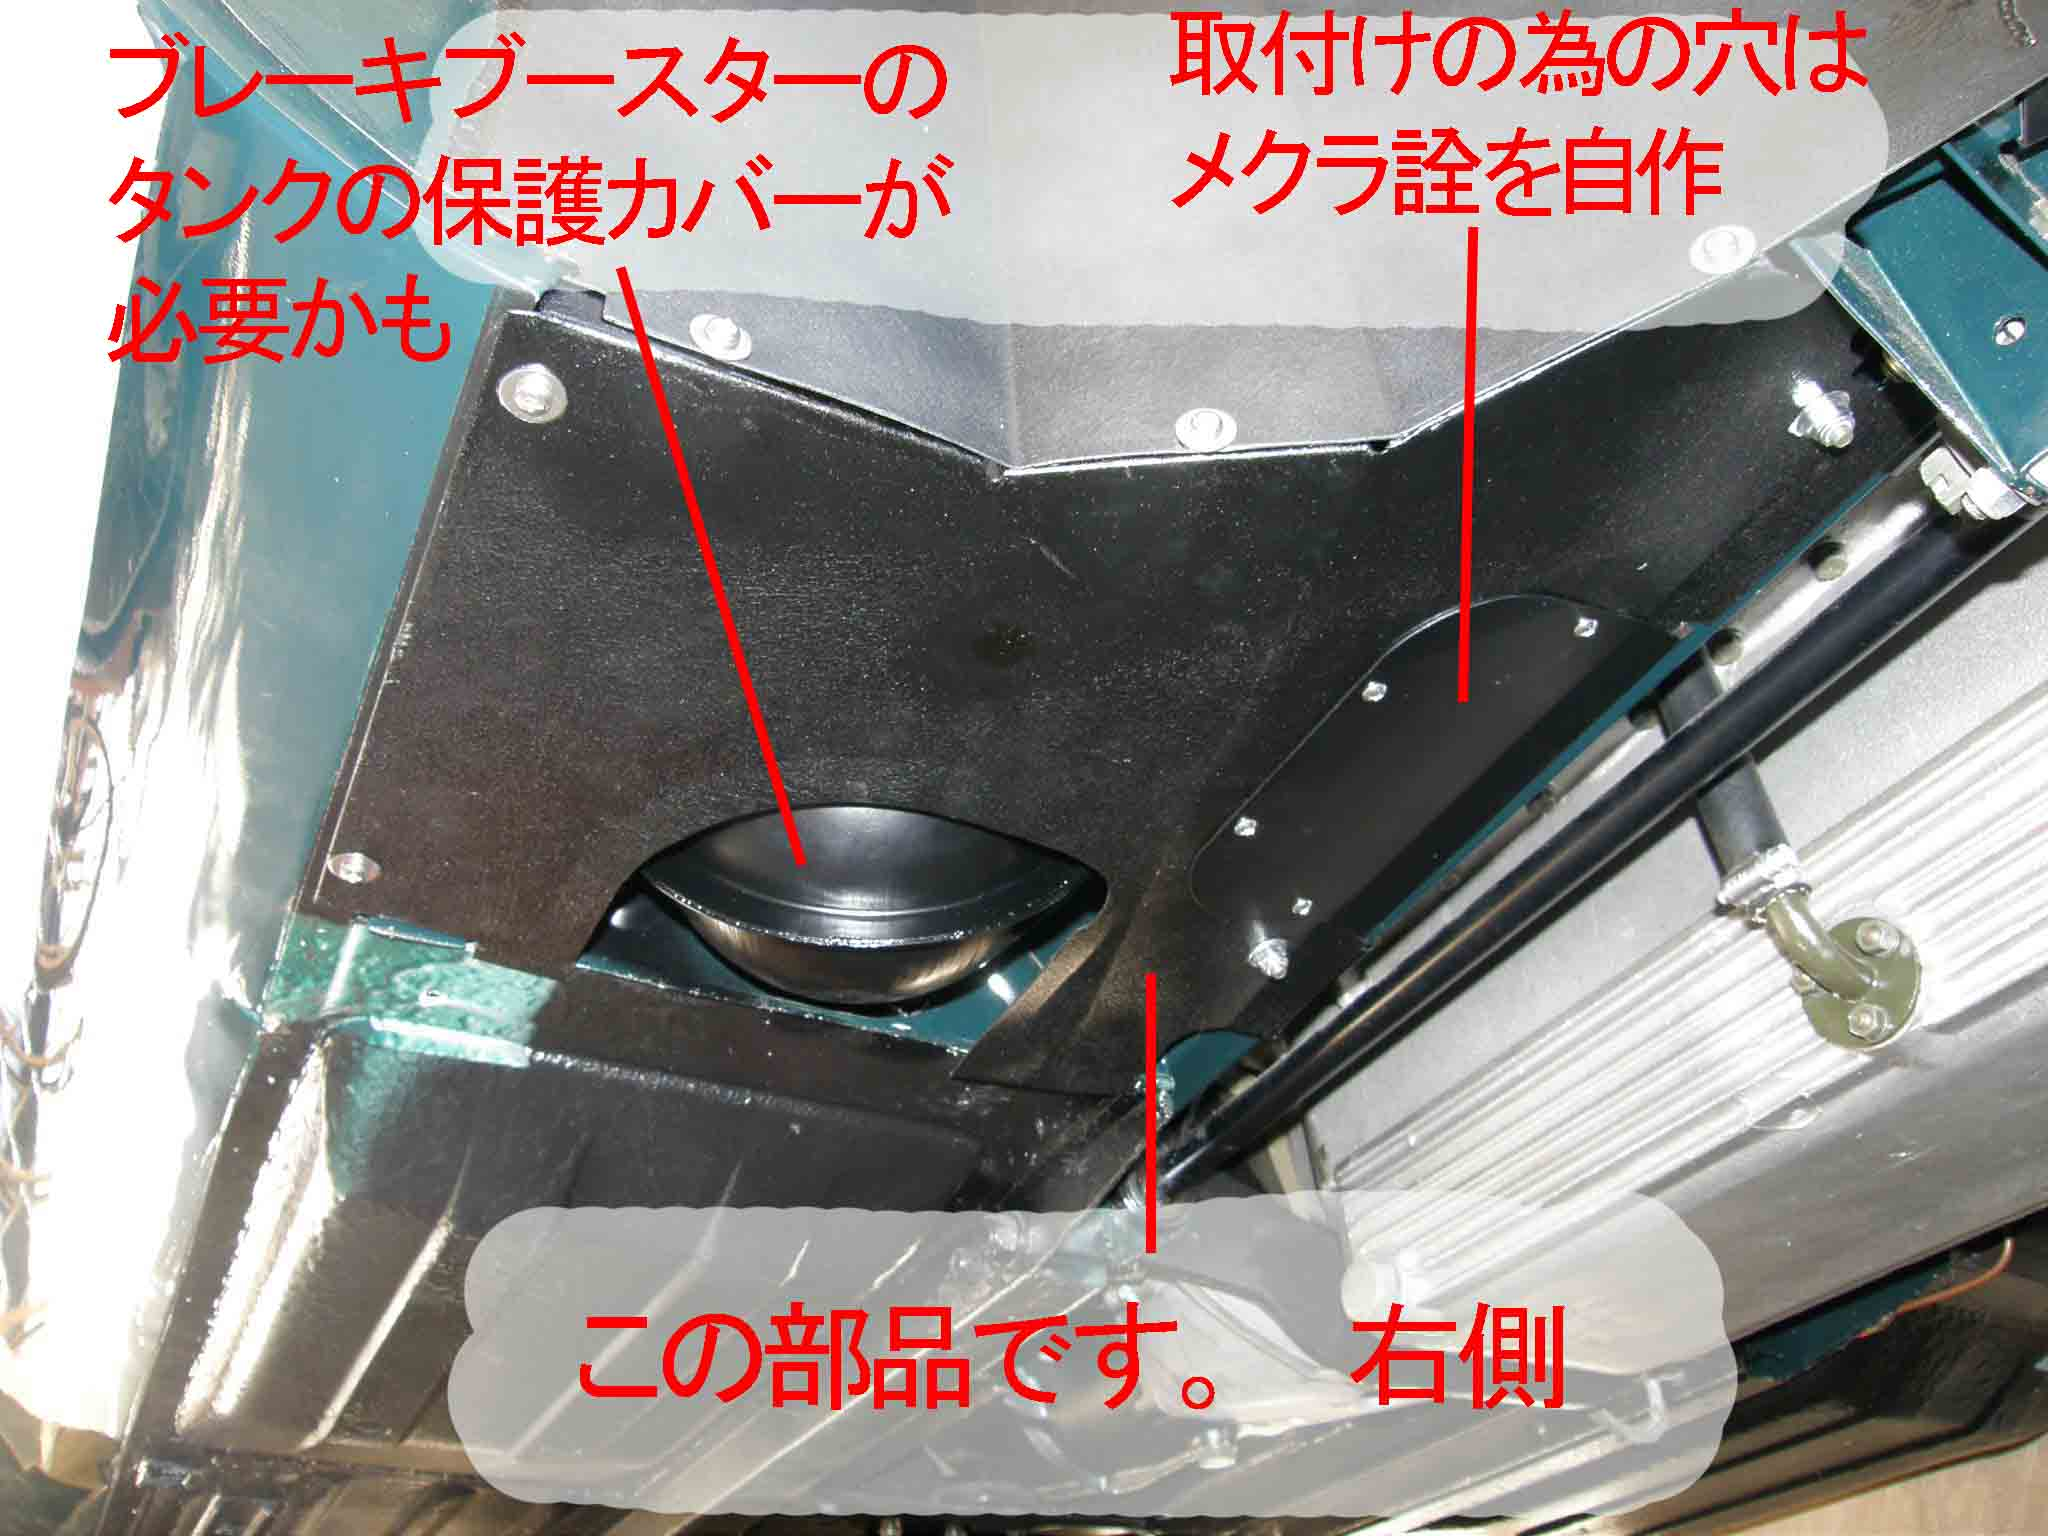 blogP9250162.jpg